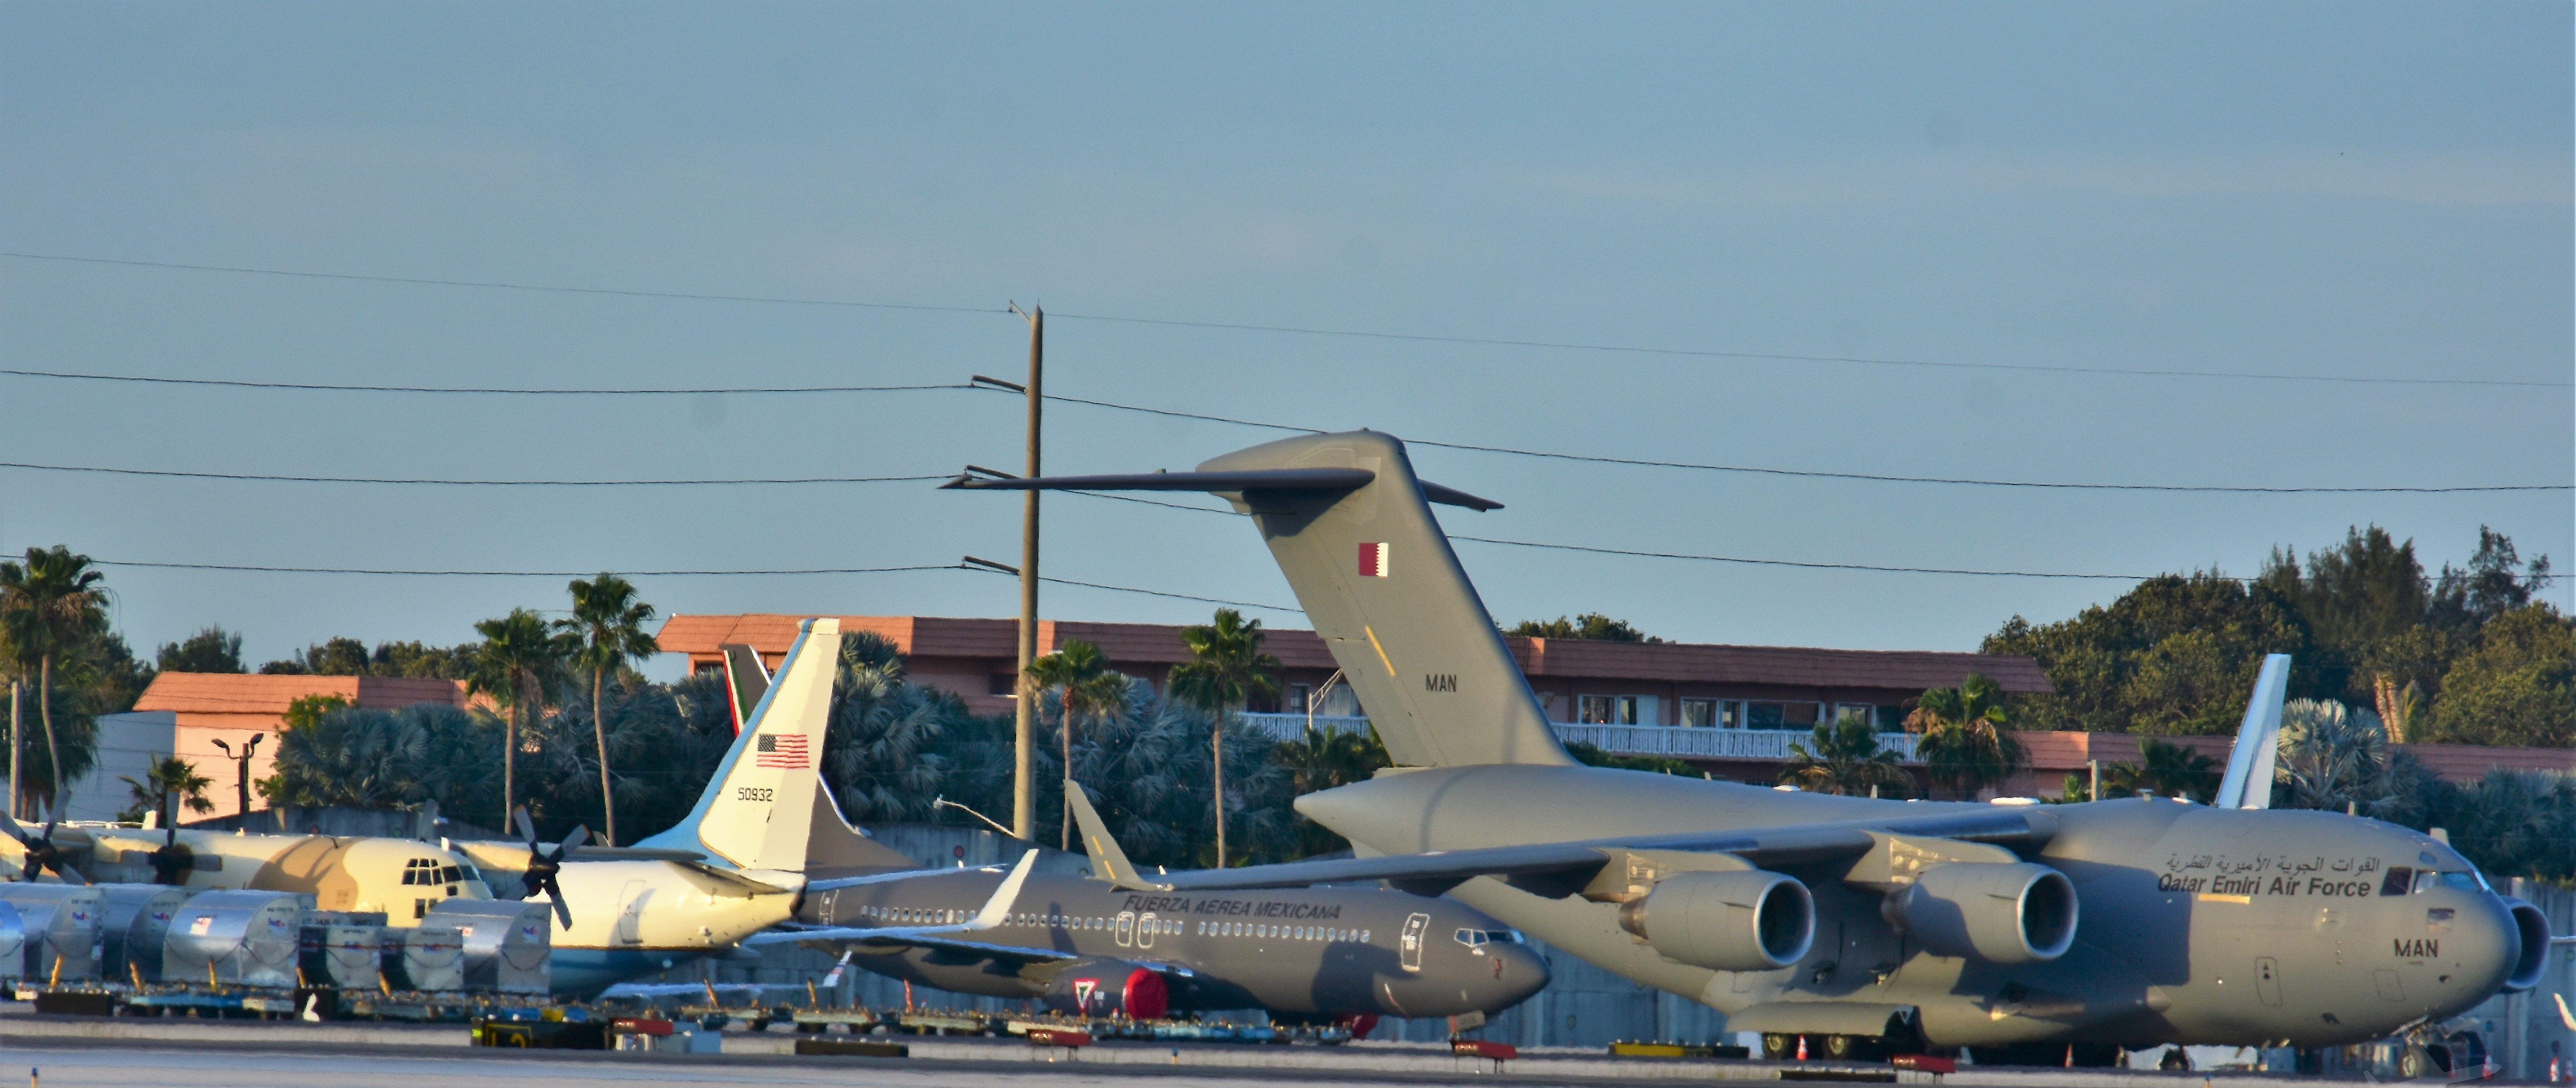 FRA: Photos d'avions de transport - Page 31 34182088081_75cf2f114b_o